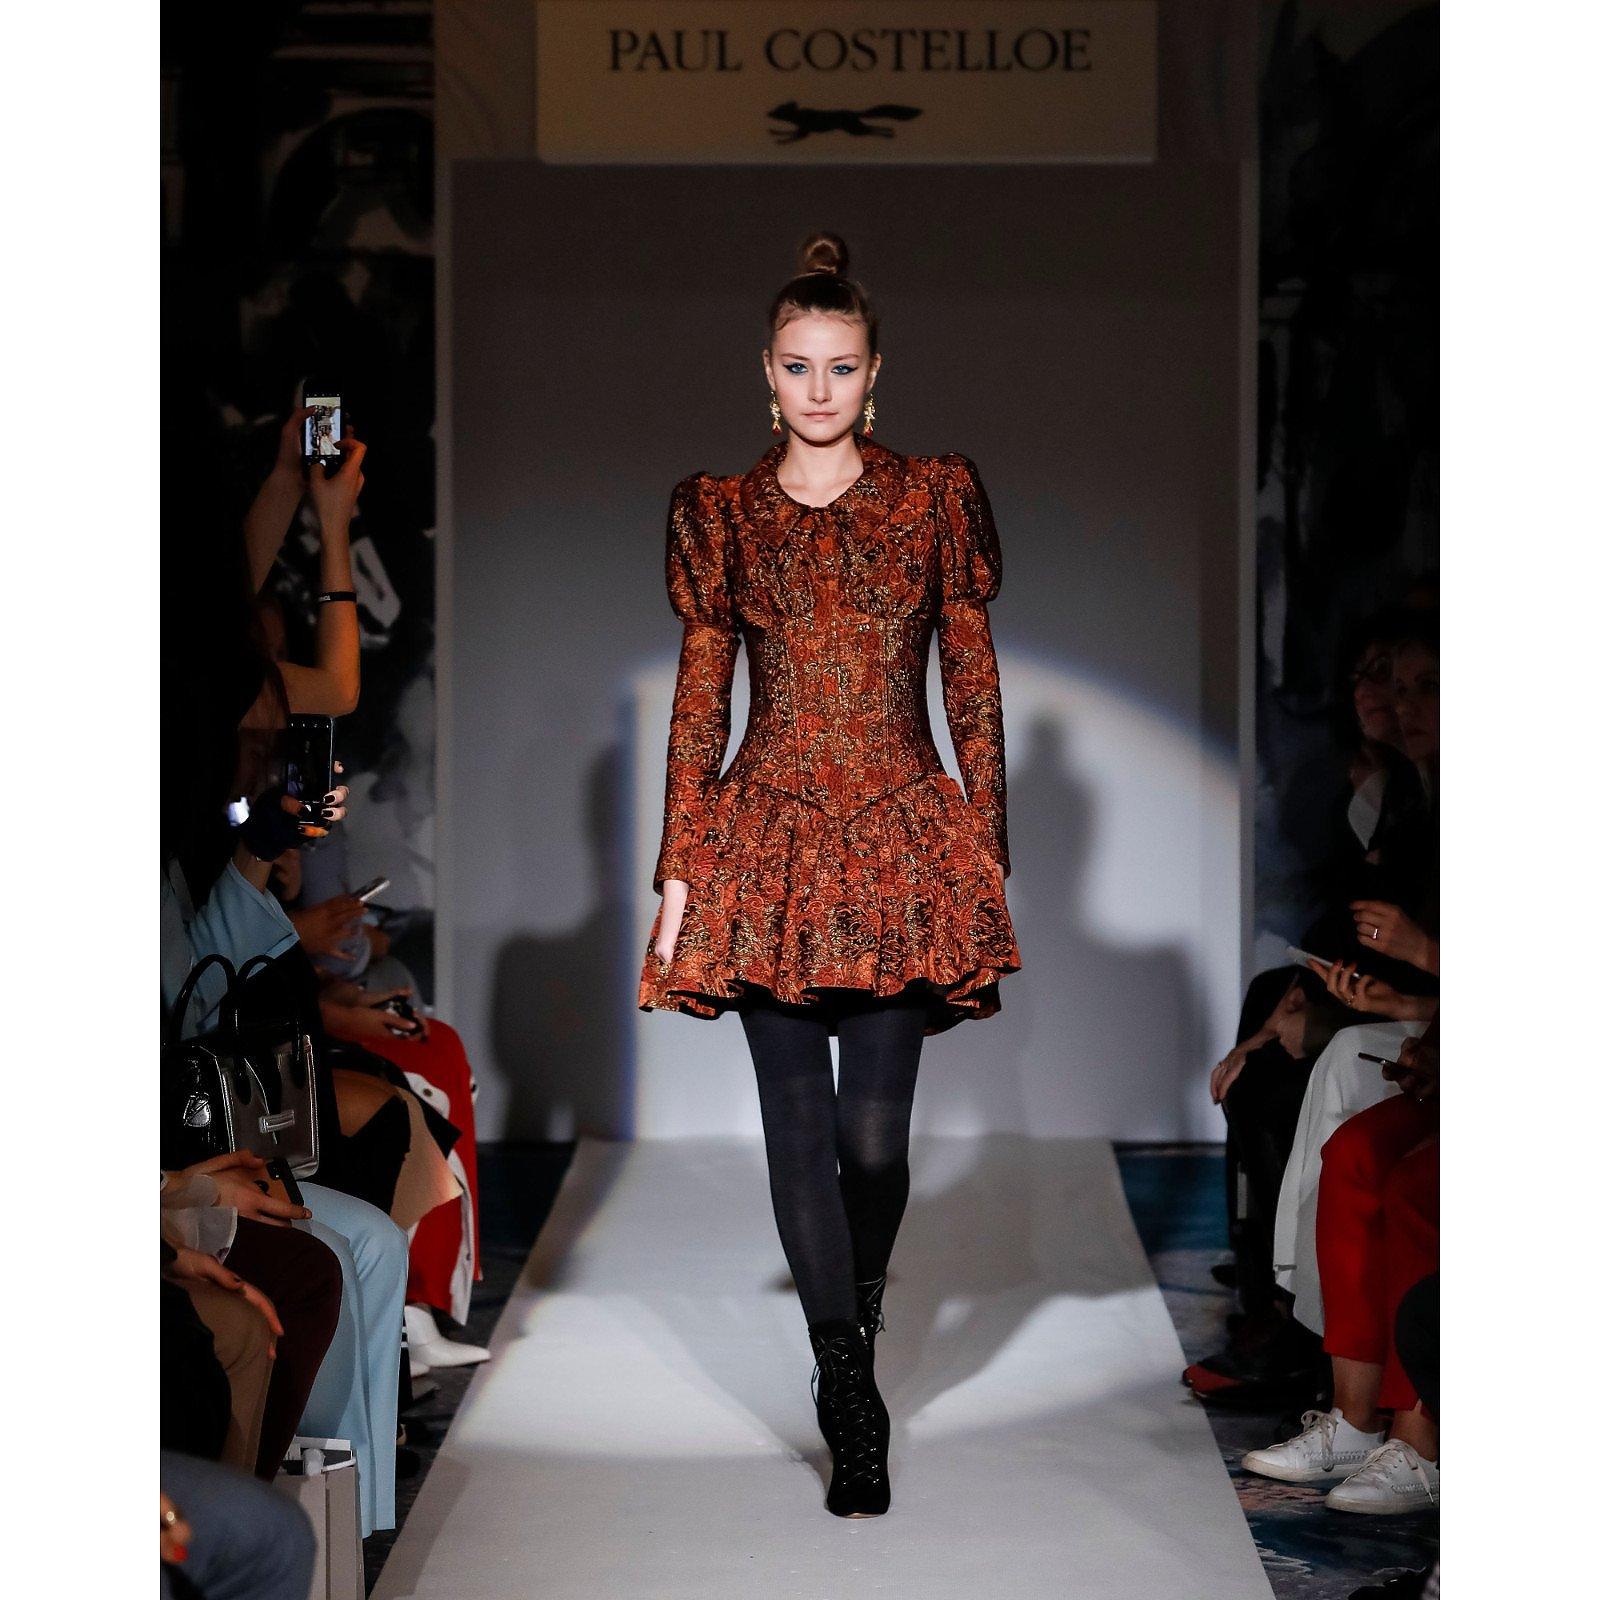 Paul Costelloe Corset Doll Dress